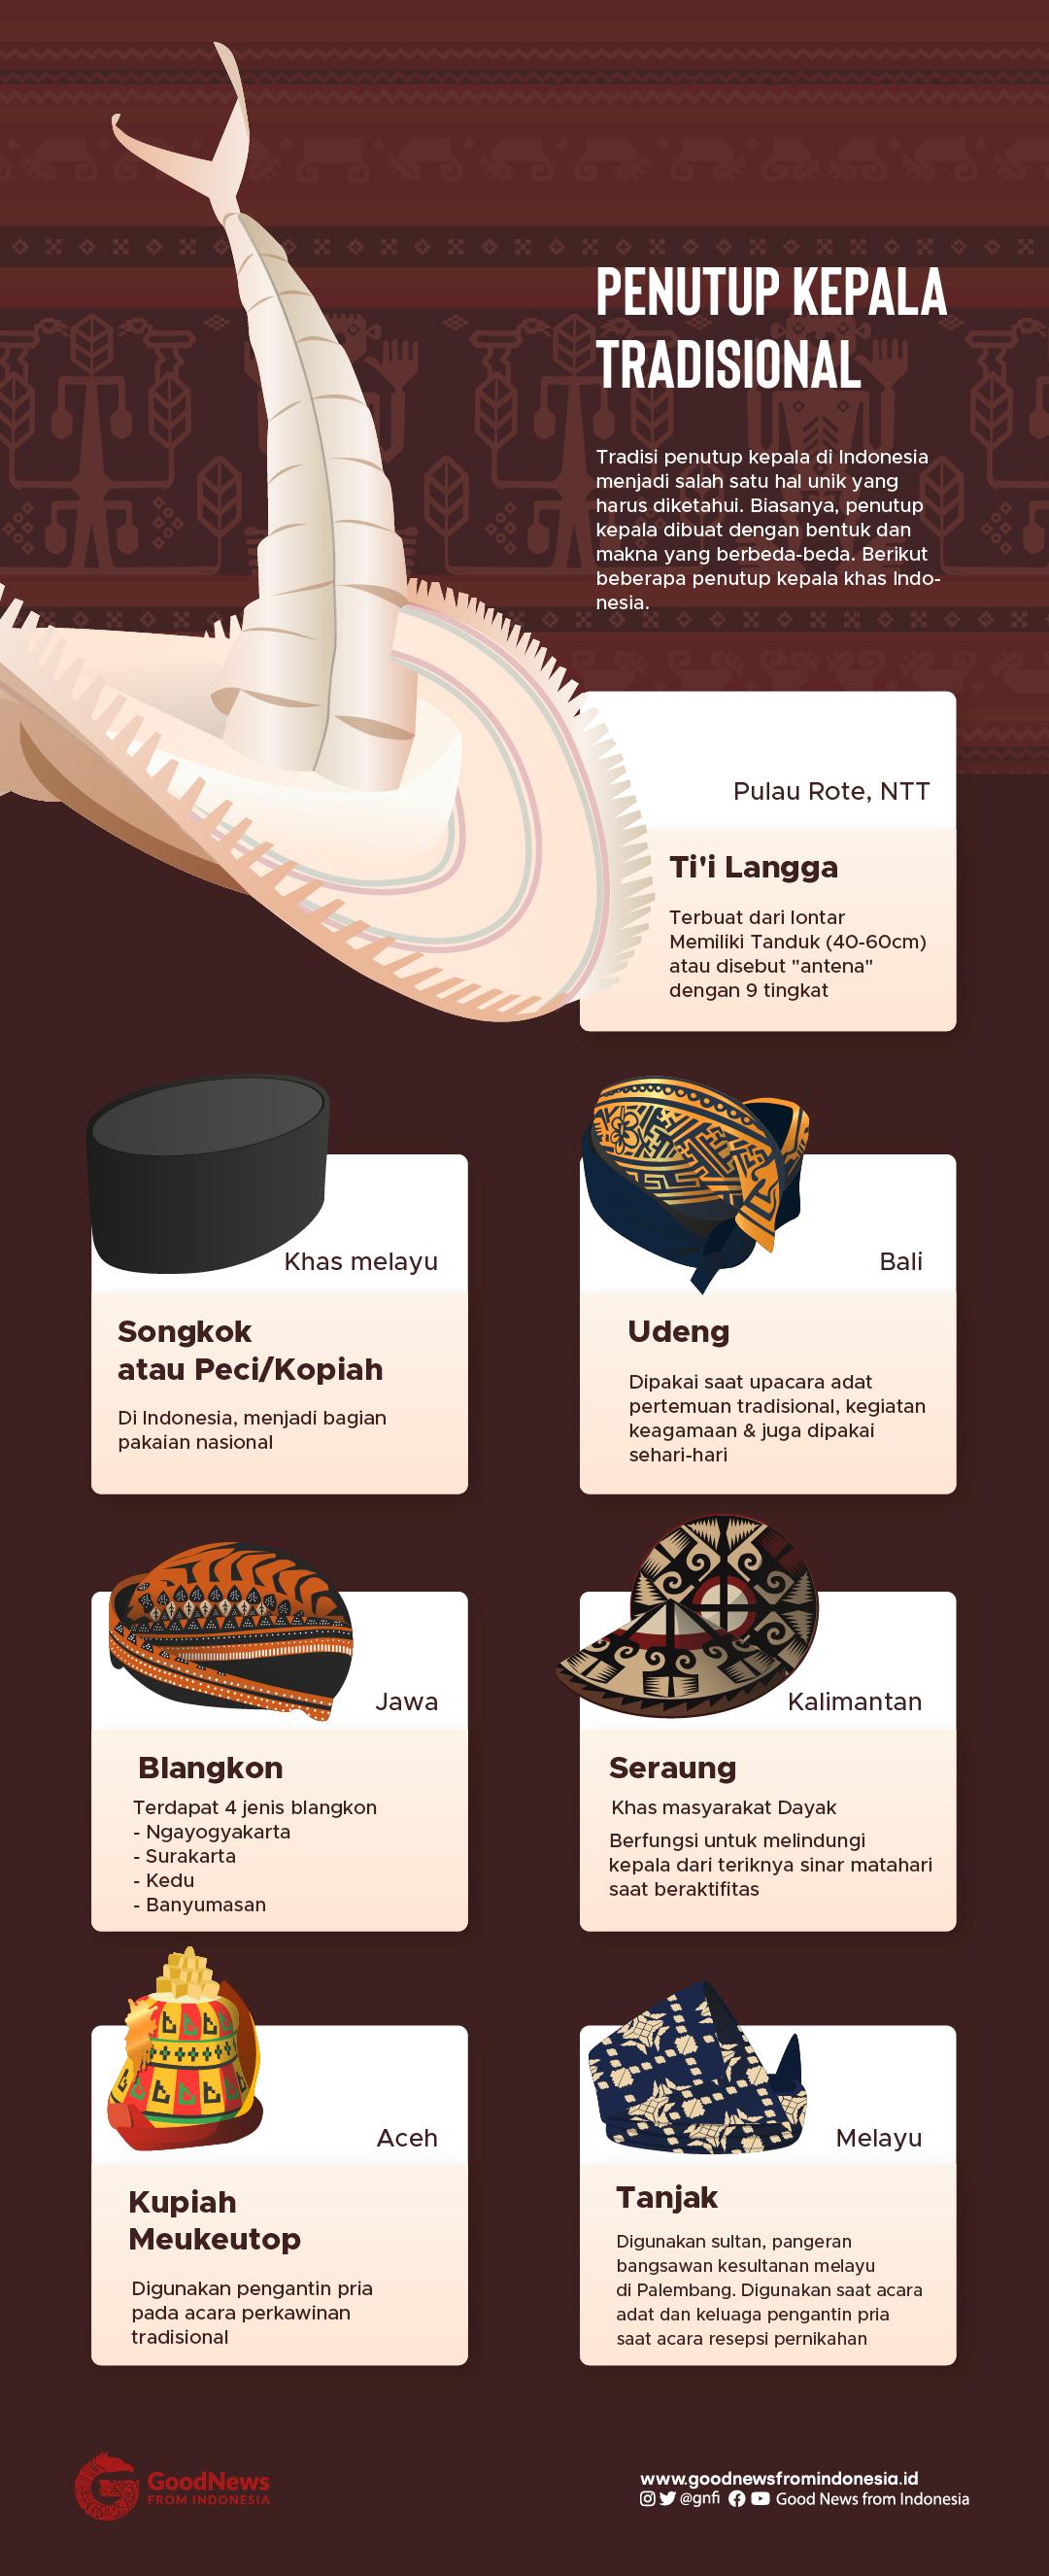 Mengenal Penutup Kepala Tradisional Indonesia